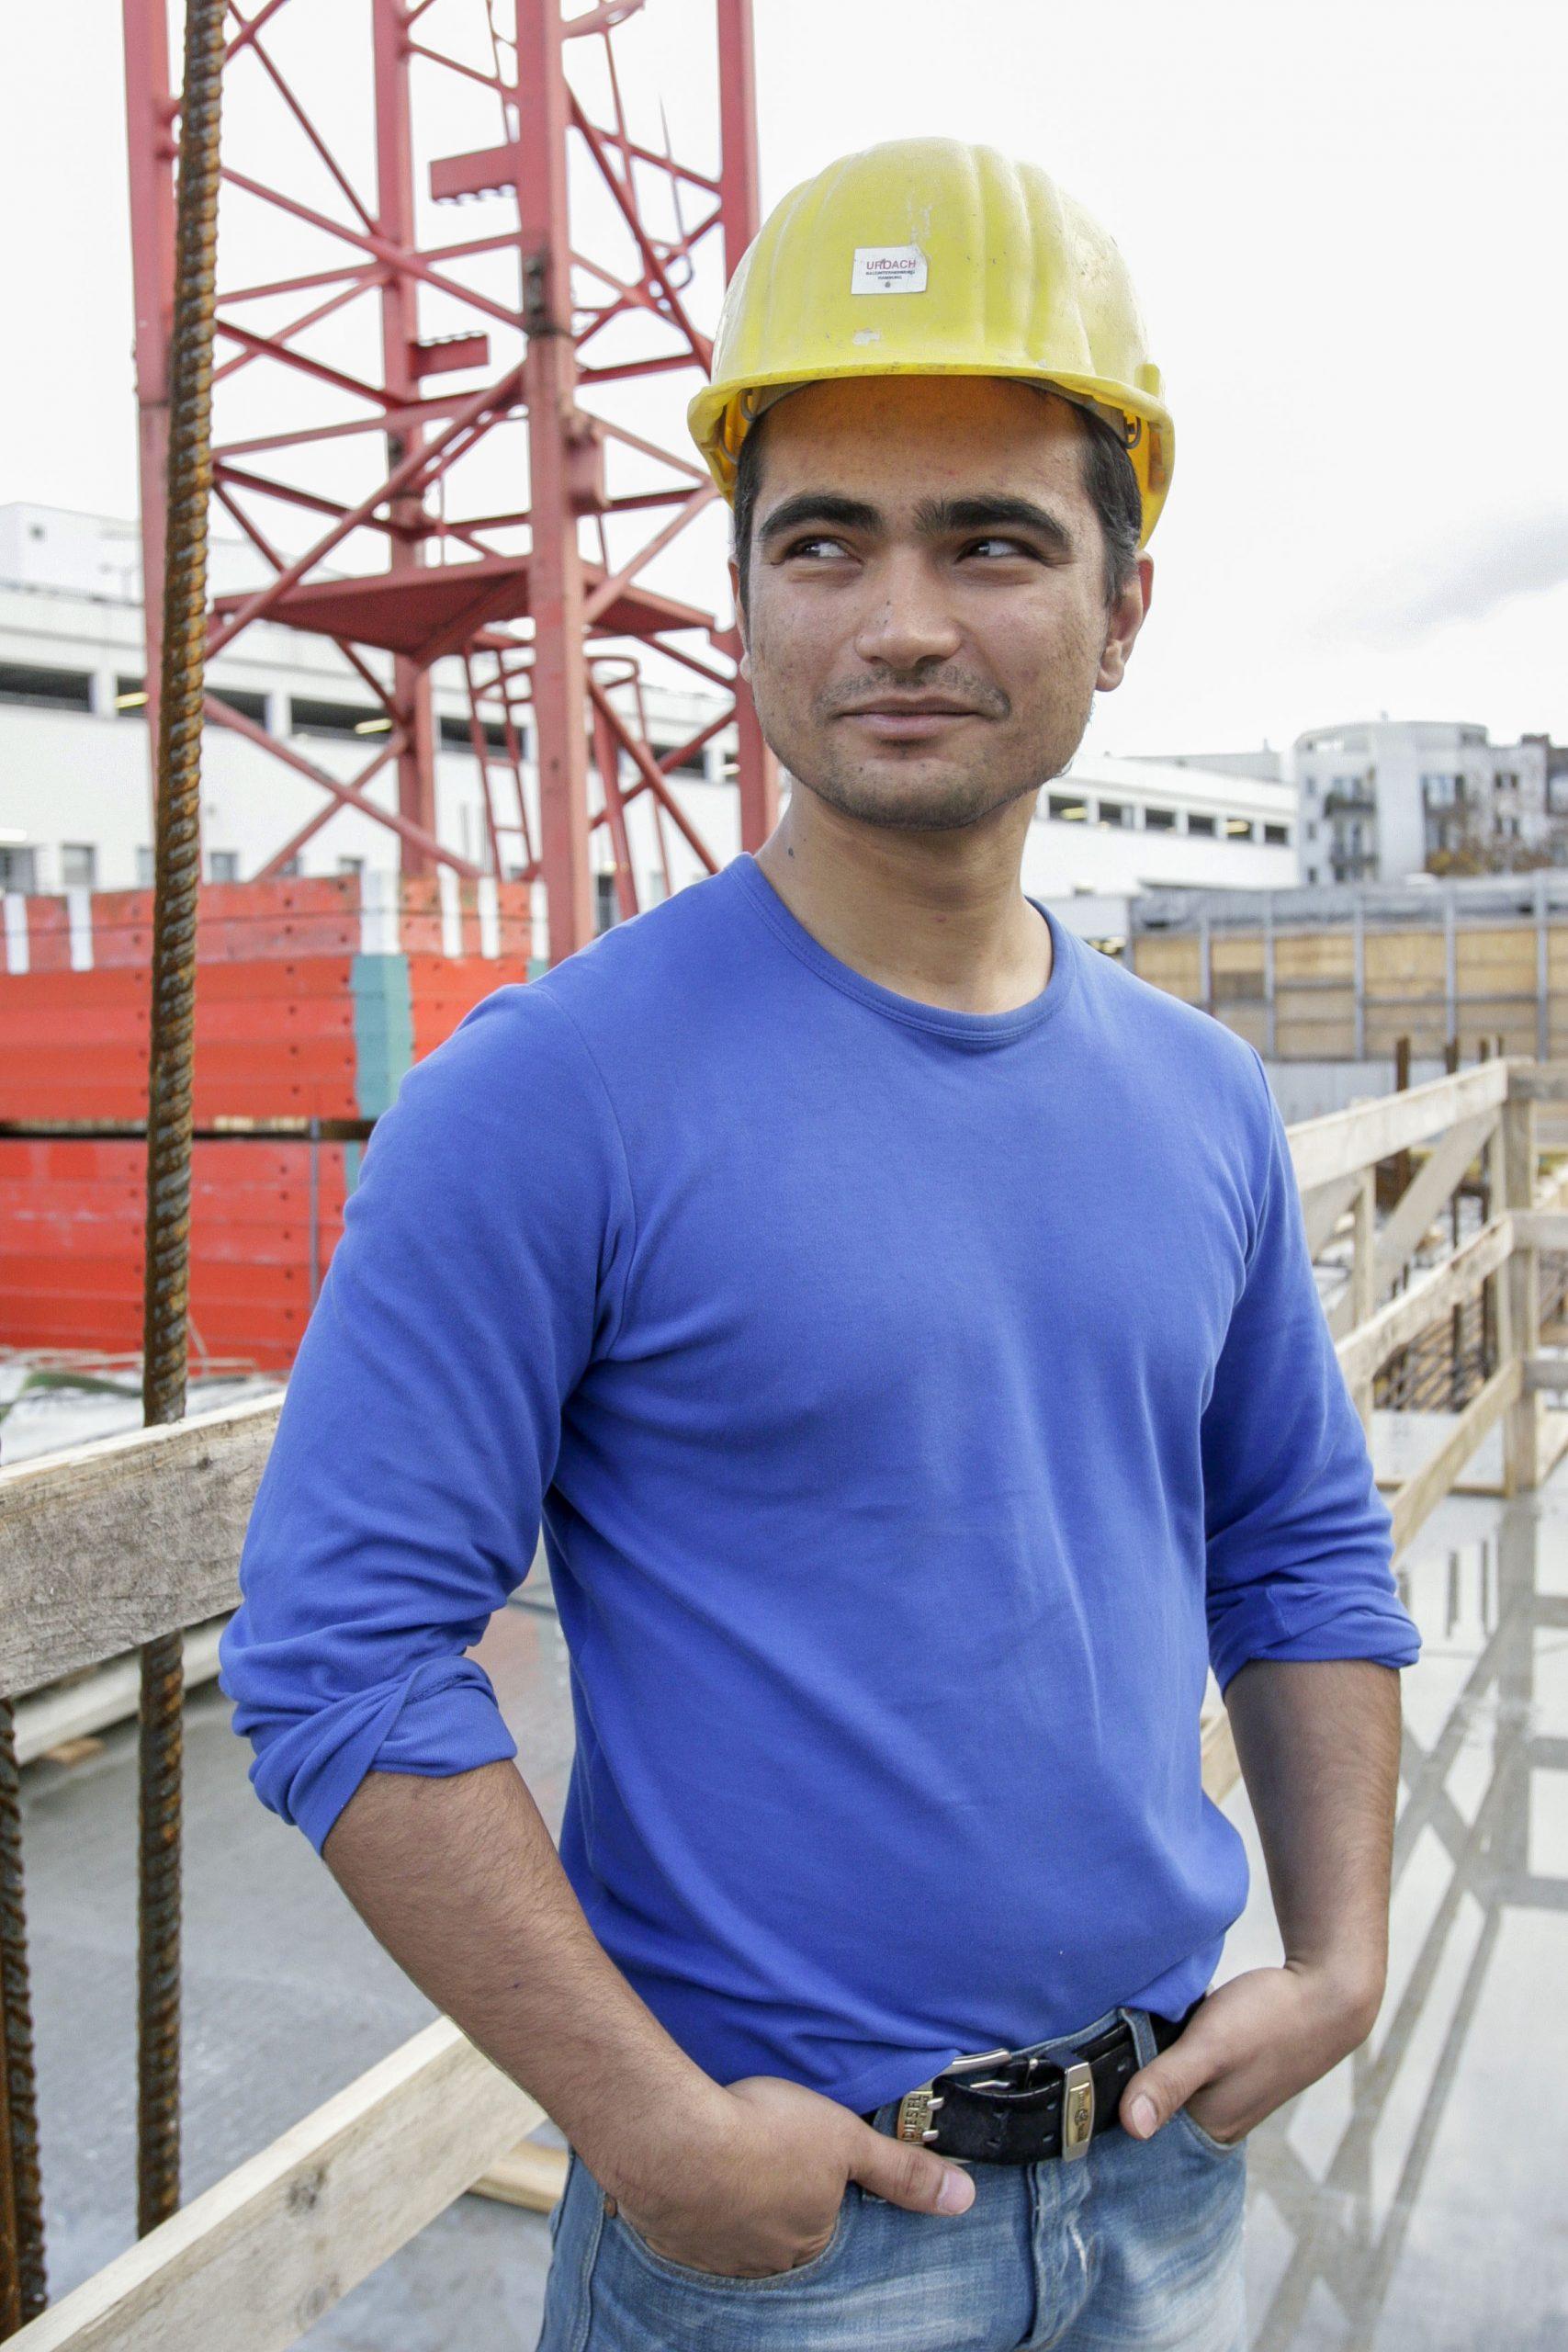 Arash Verozmand 25 Jahre aus Kabul, Afghanistanlernt Stahlbetonbauer